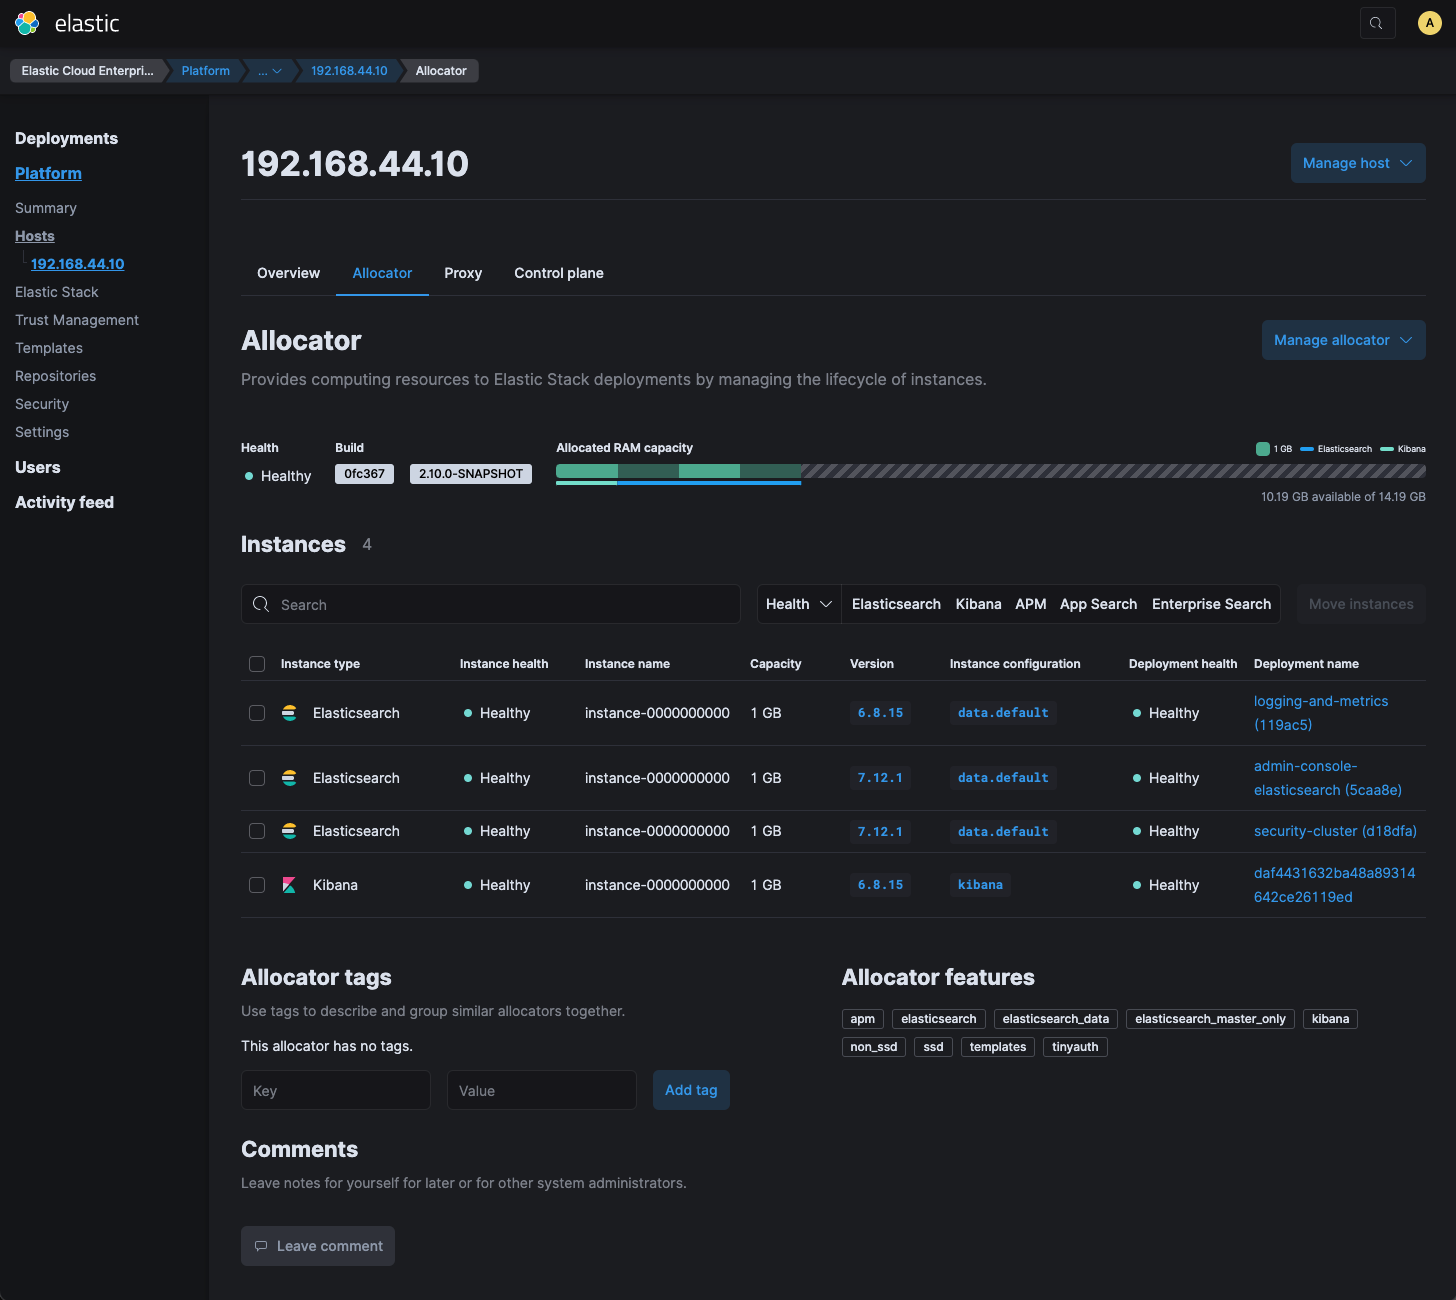 Screenshot of allocator page